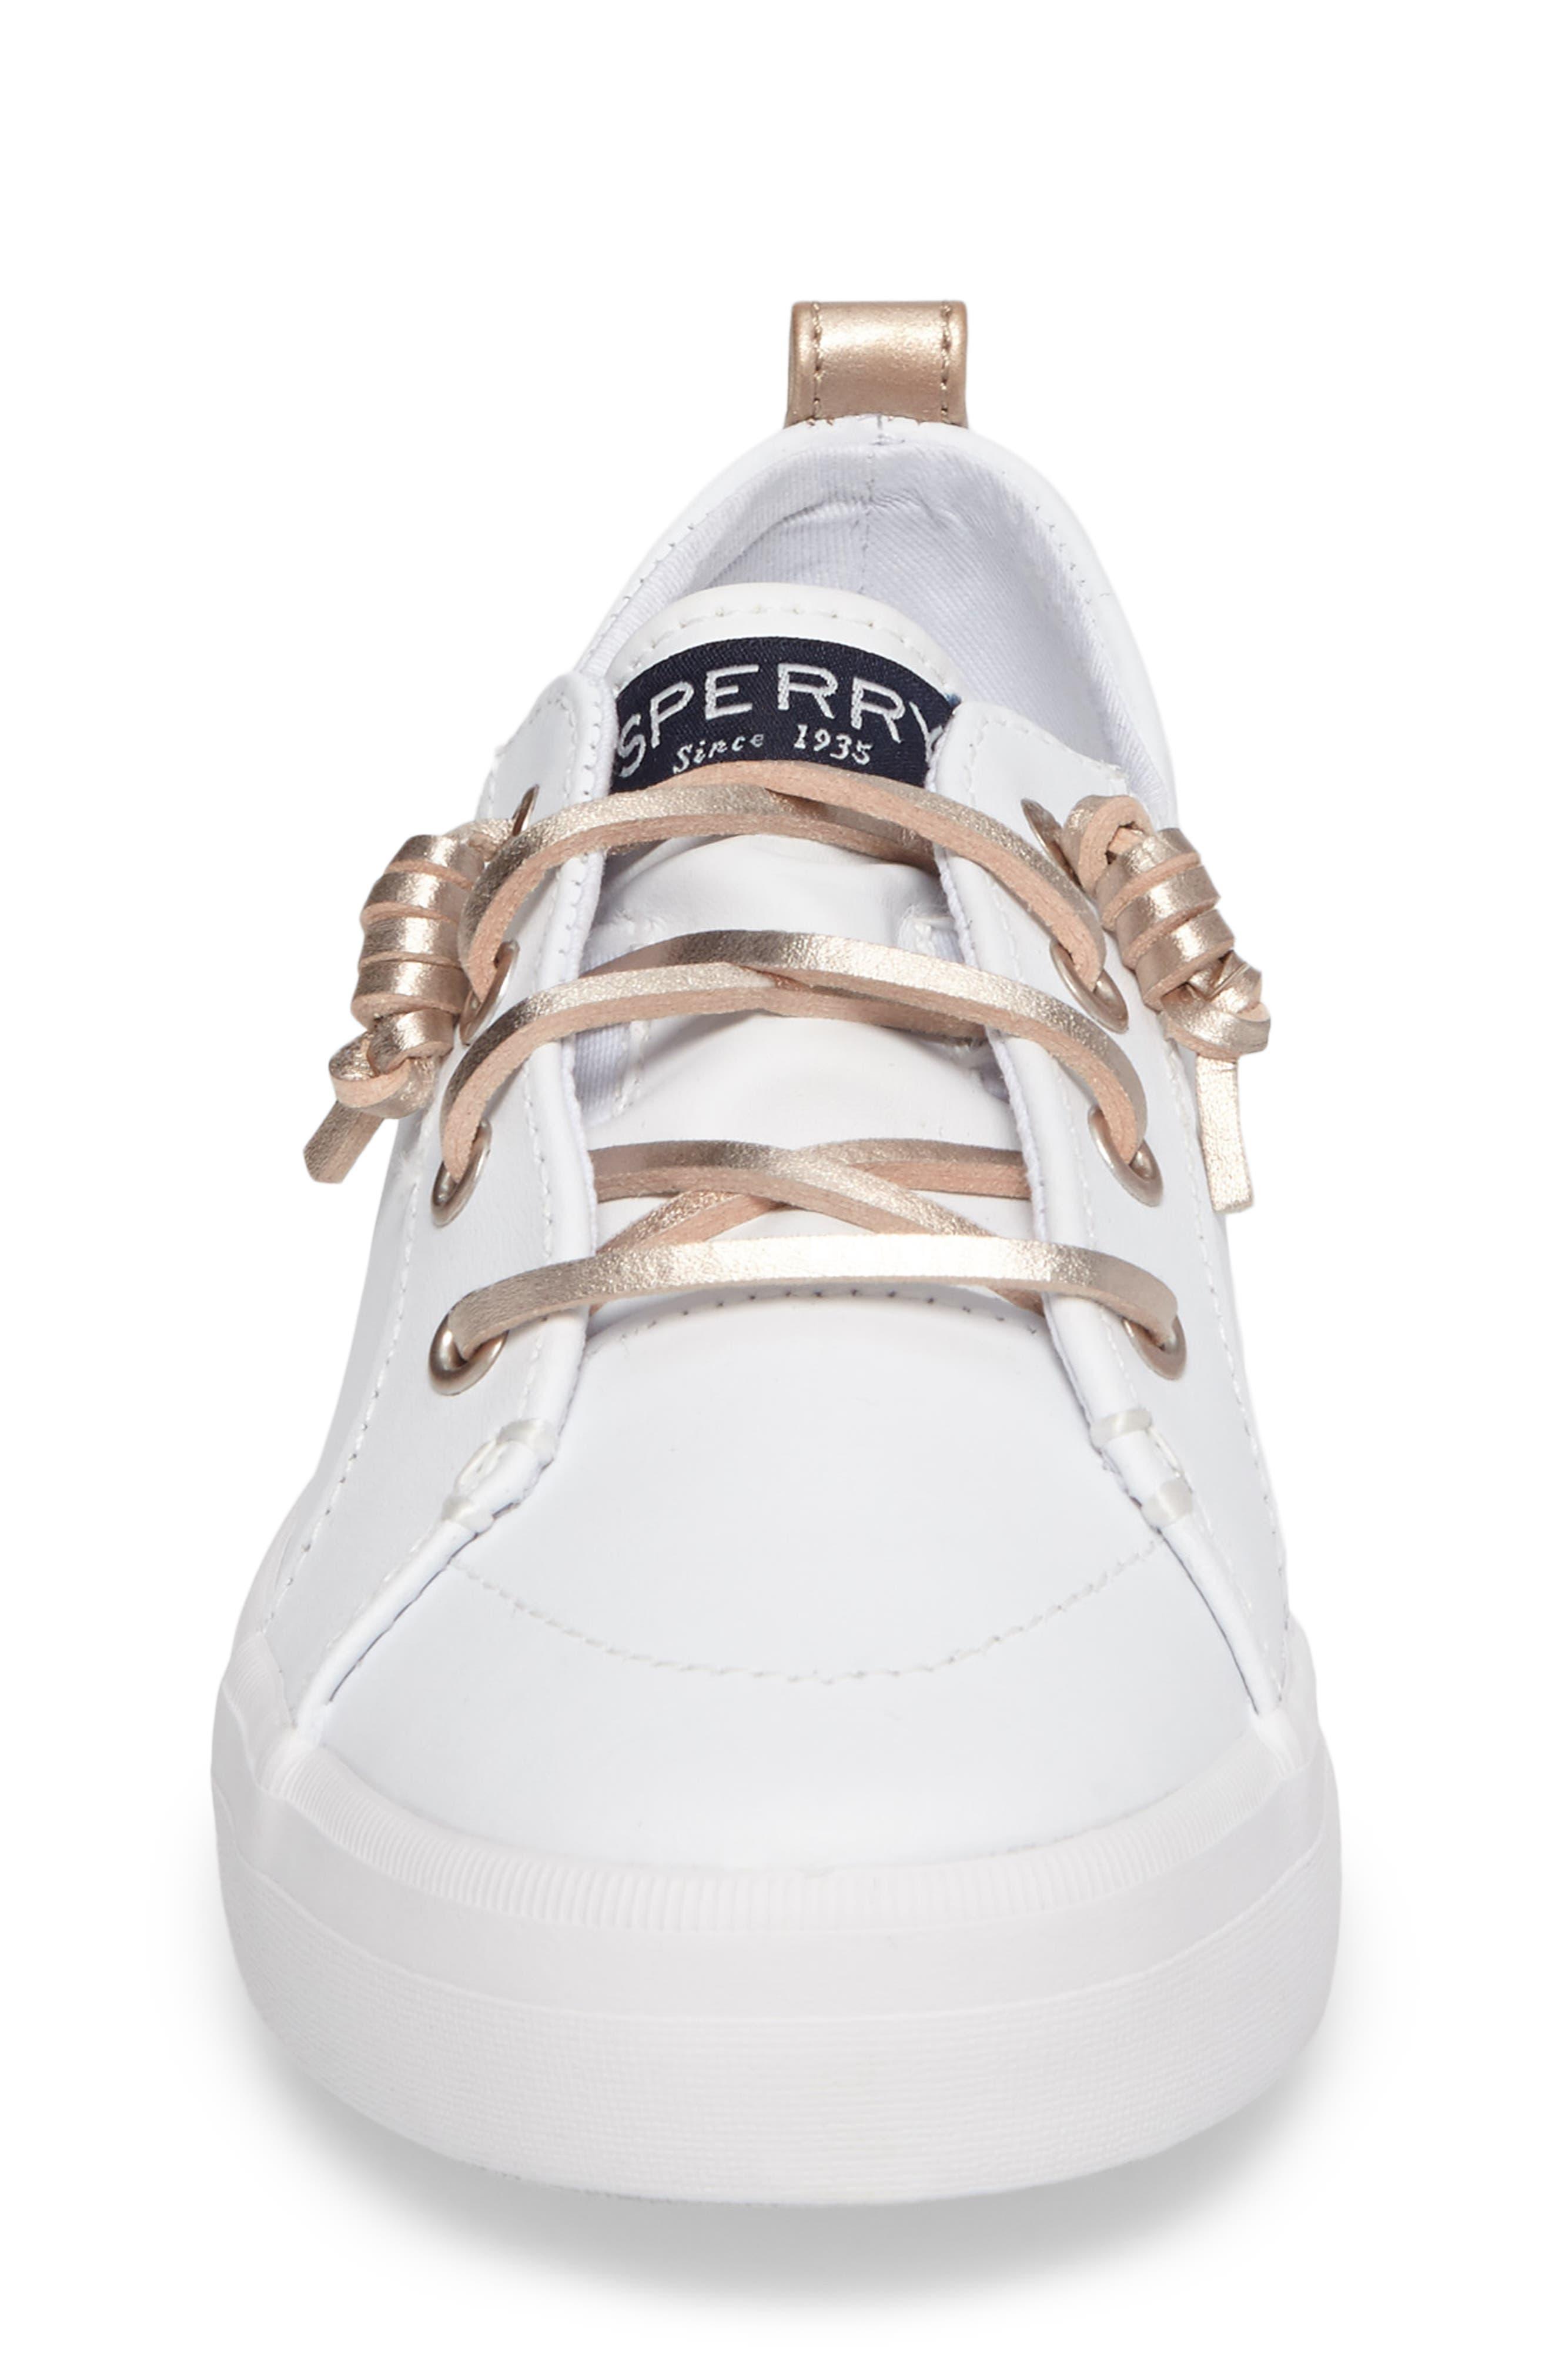 Sperry Crest Vibe Sneaker,                             Alternate thumbnail 4, color,                             WHITE LEATHER